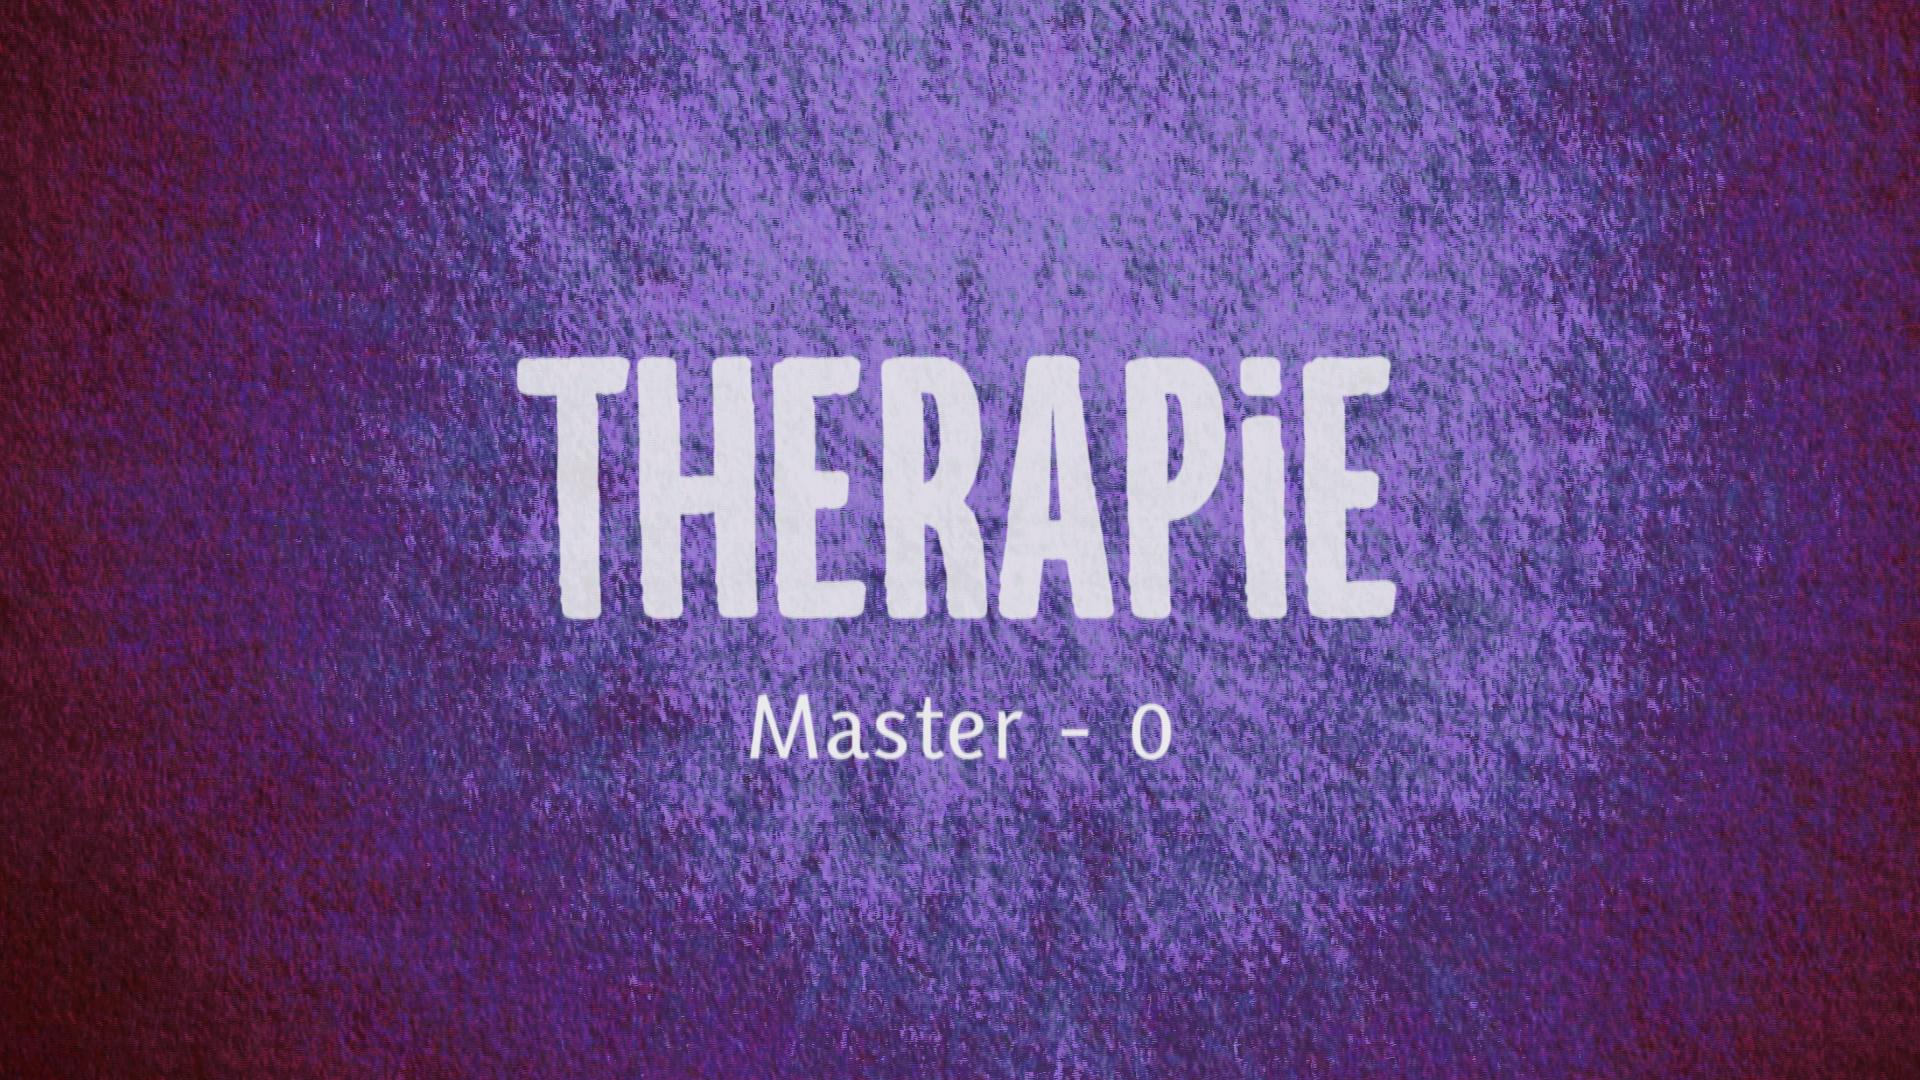 THERAPIE-MASTER-0